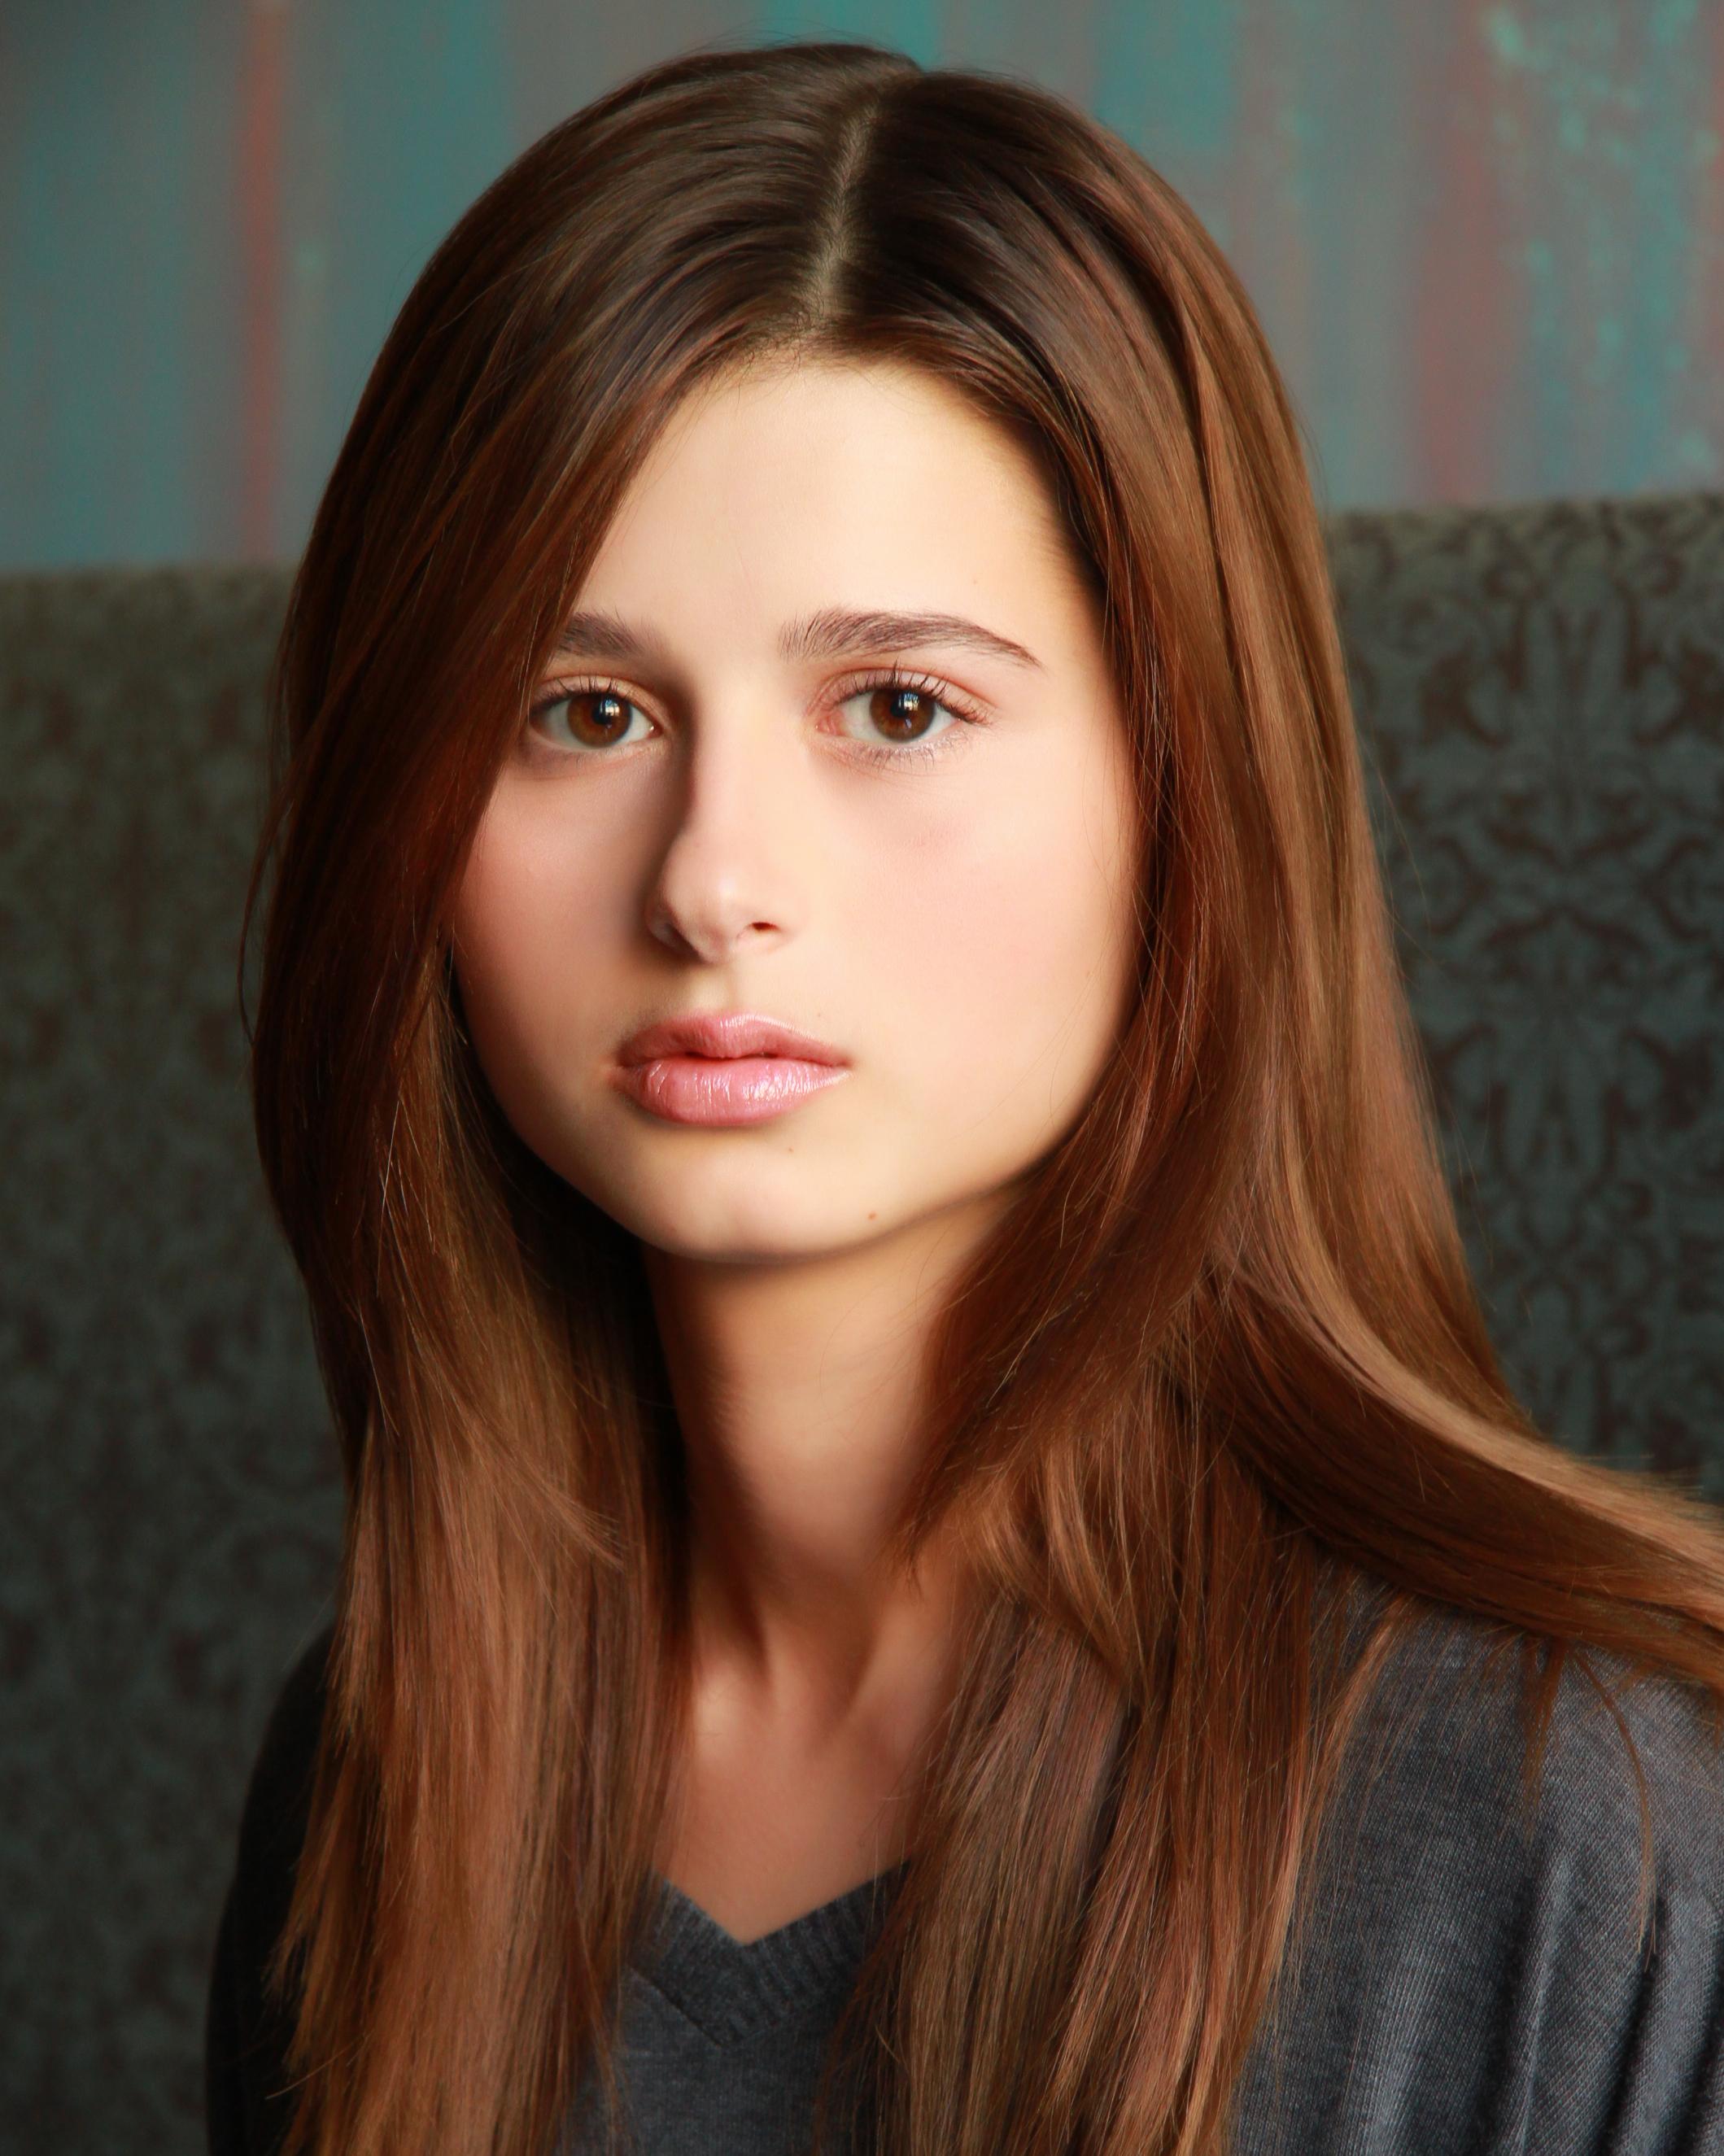 Female model headshot in grey shirt